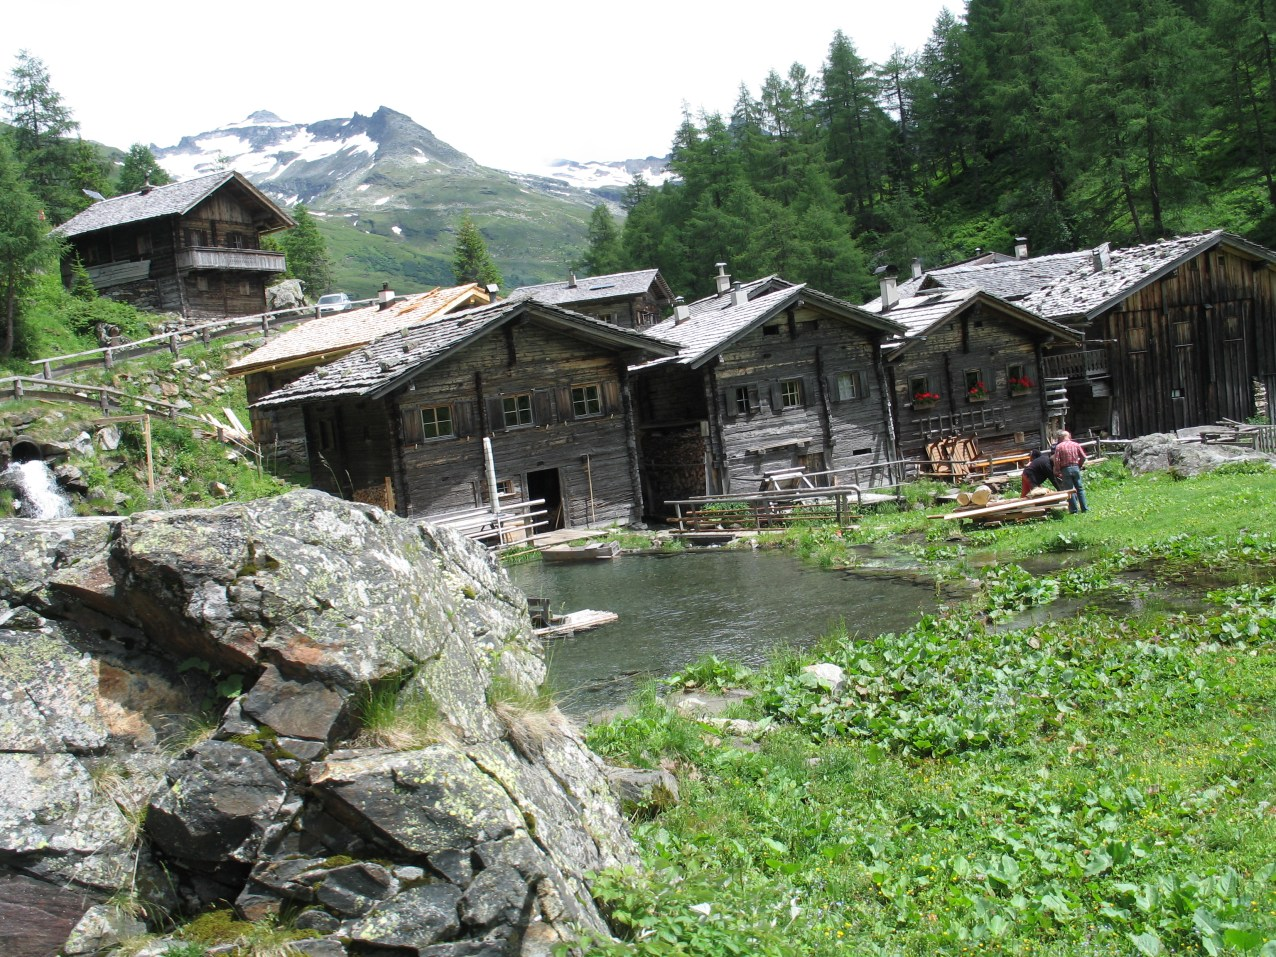 Stara alpejska wioska